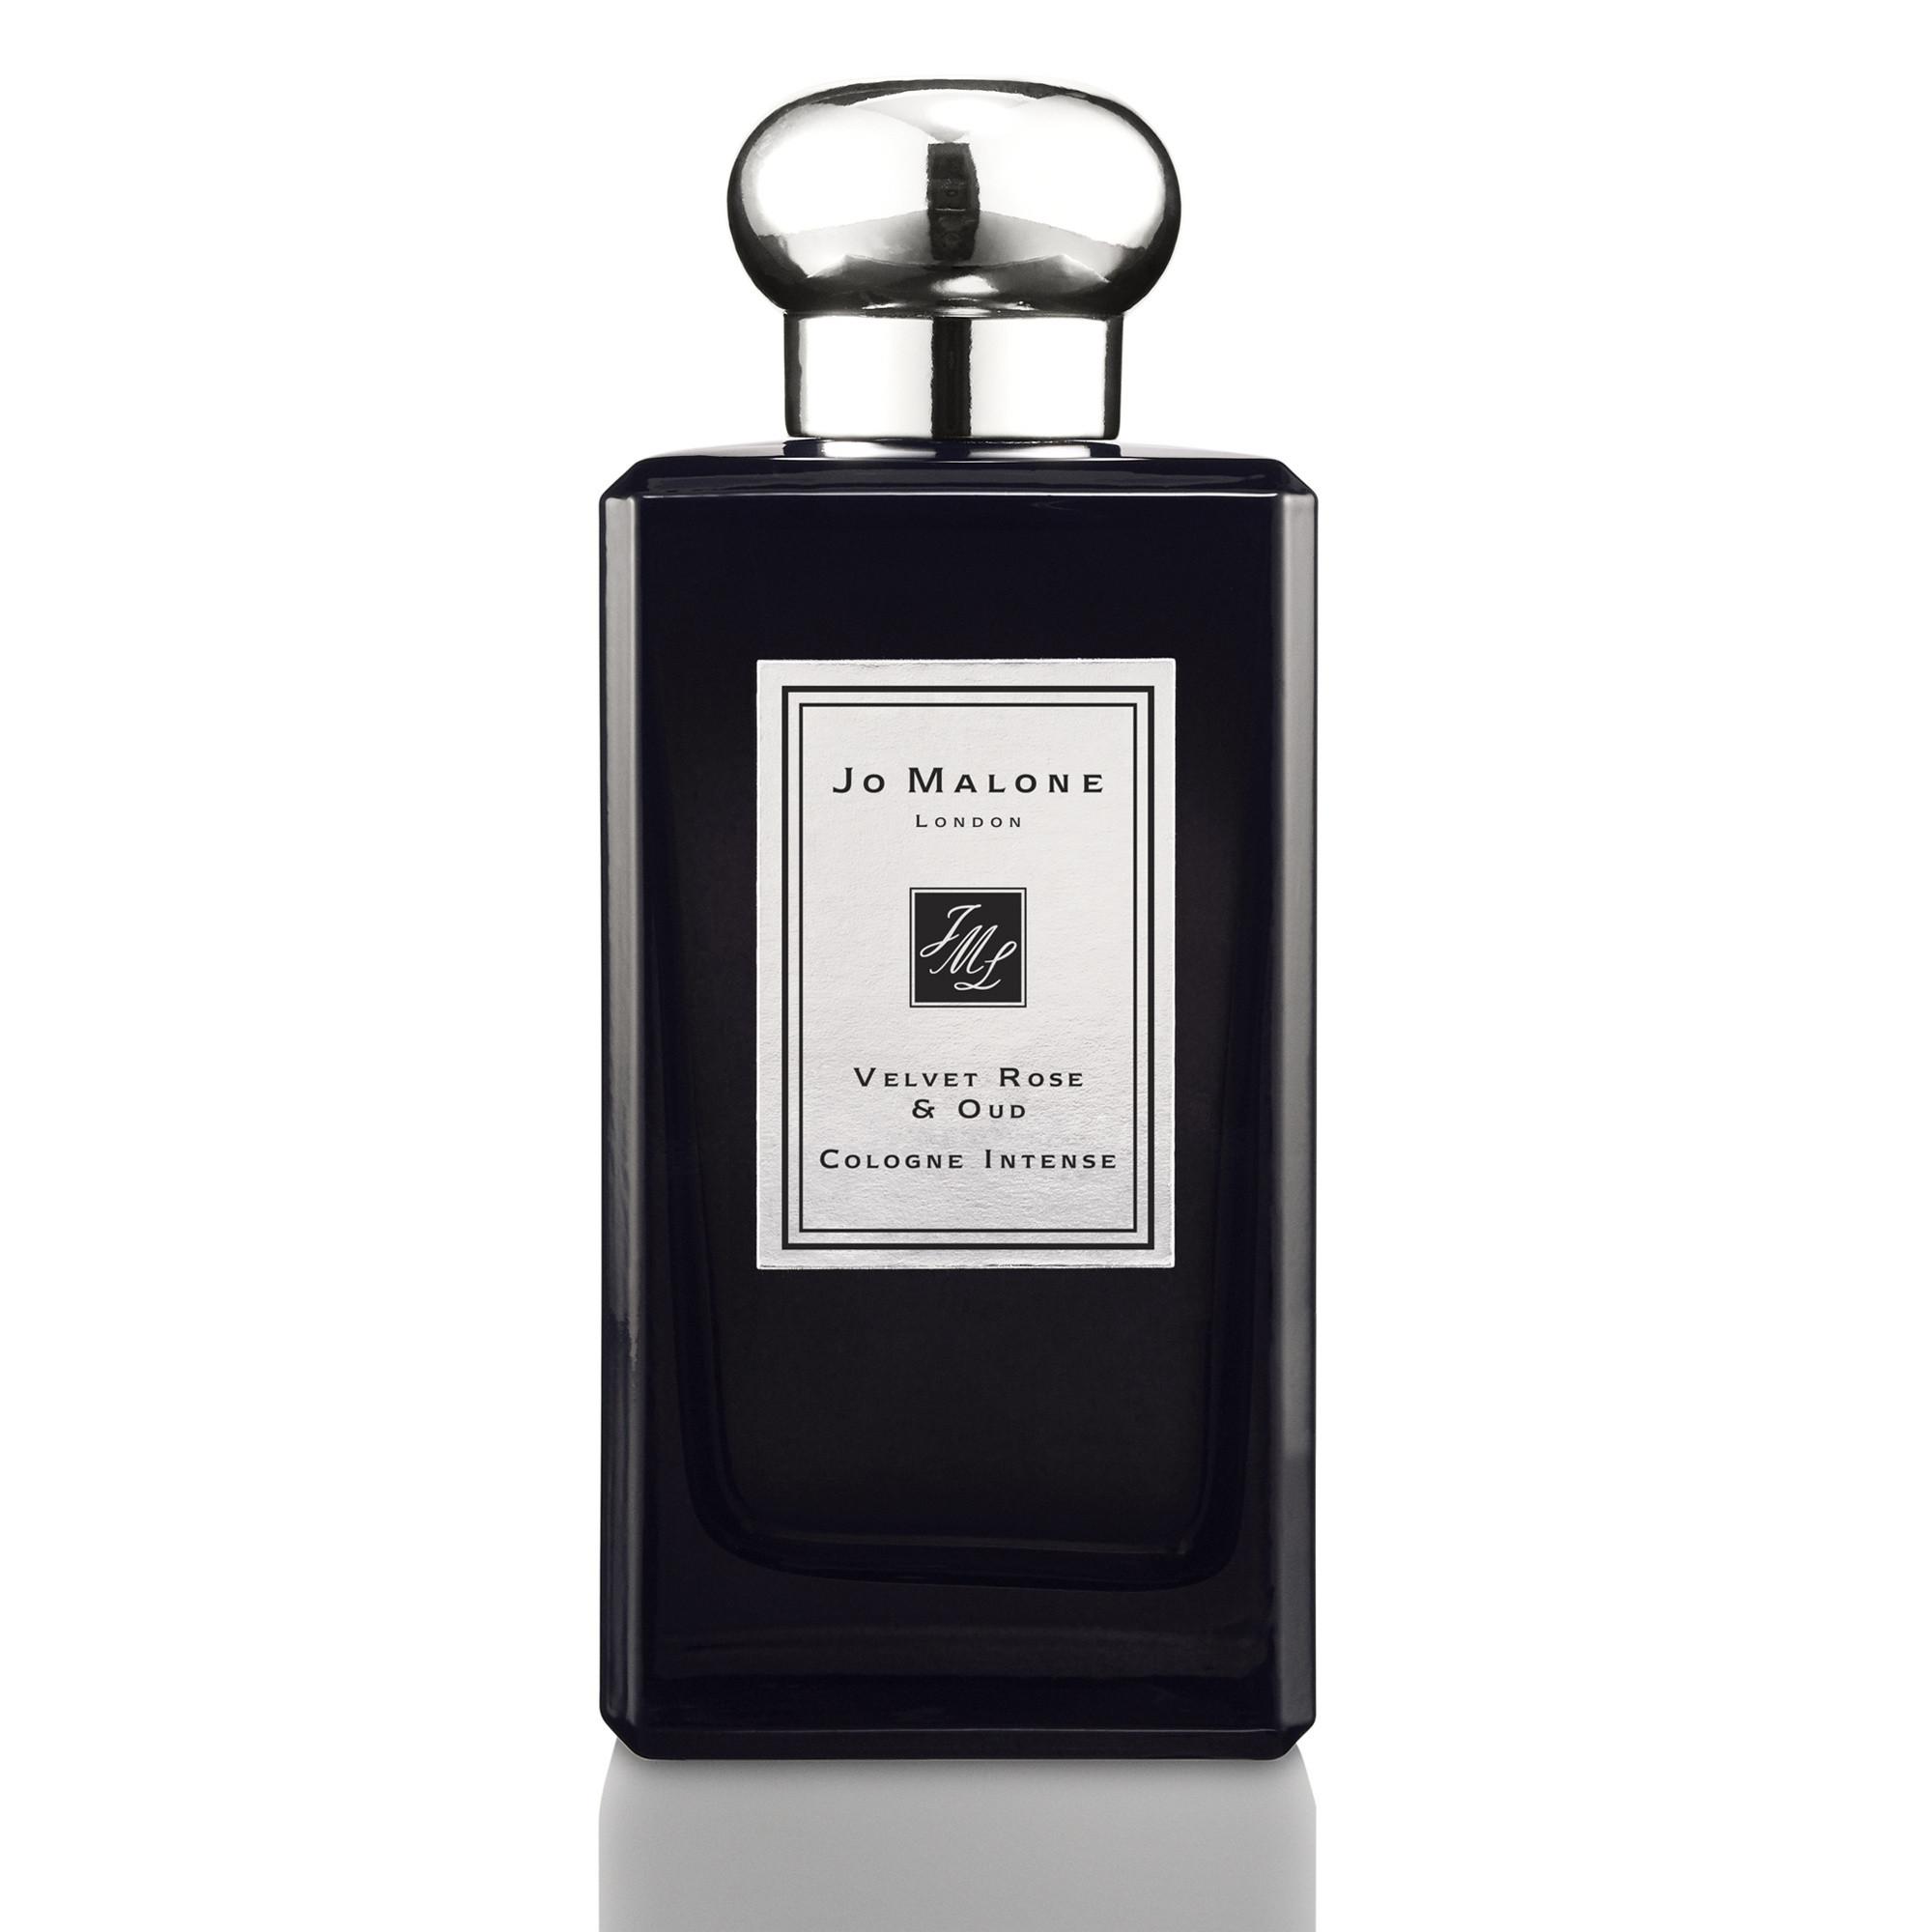 Jo Malone London velvet rose & oud cologne intense 100 ml, Beige, large image number 0